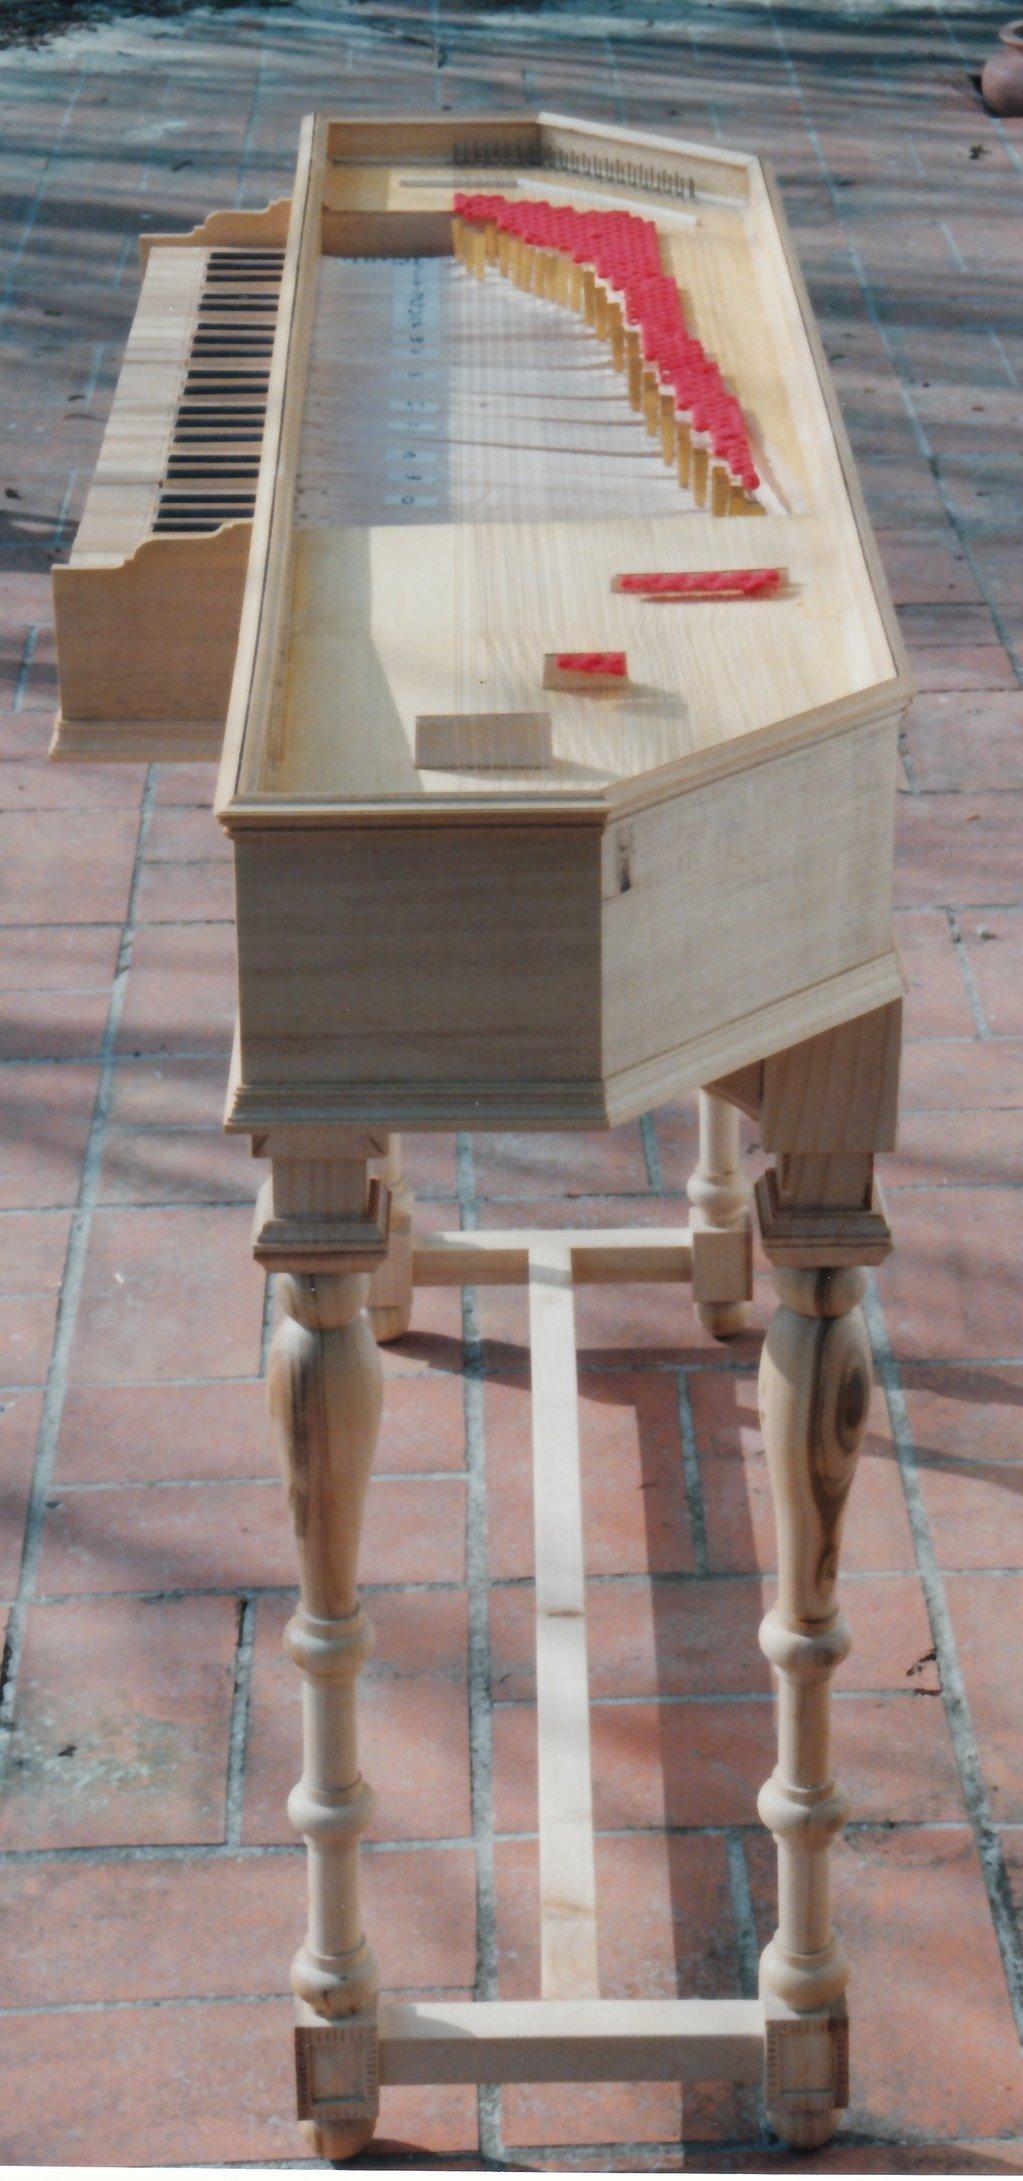 Fabrication d'instruments de musique anciens de bgire 9JQ3Ib-1992-Clavicorde-Pisaurensis-49